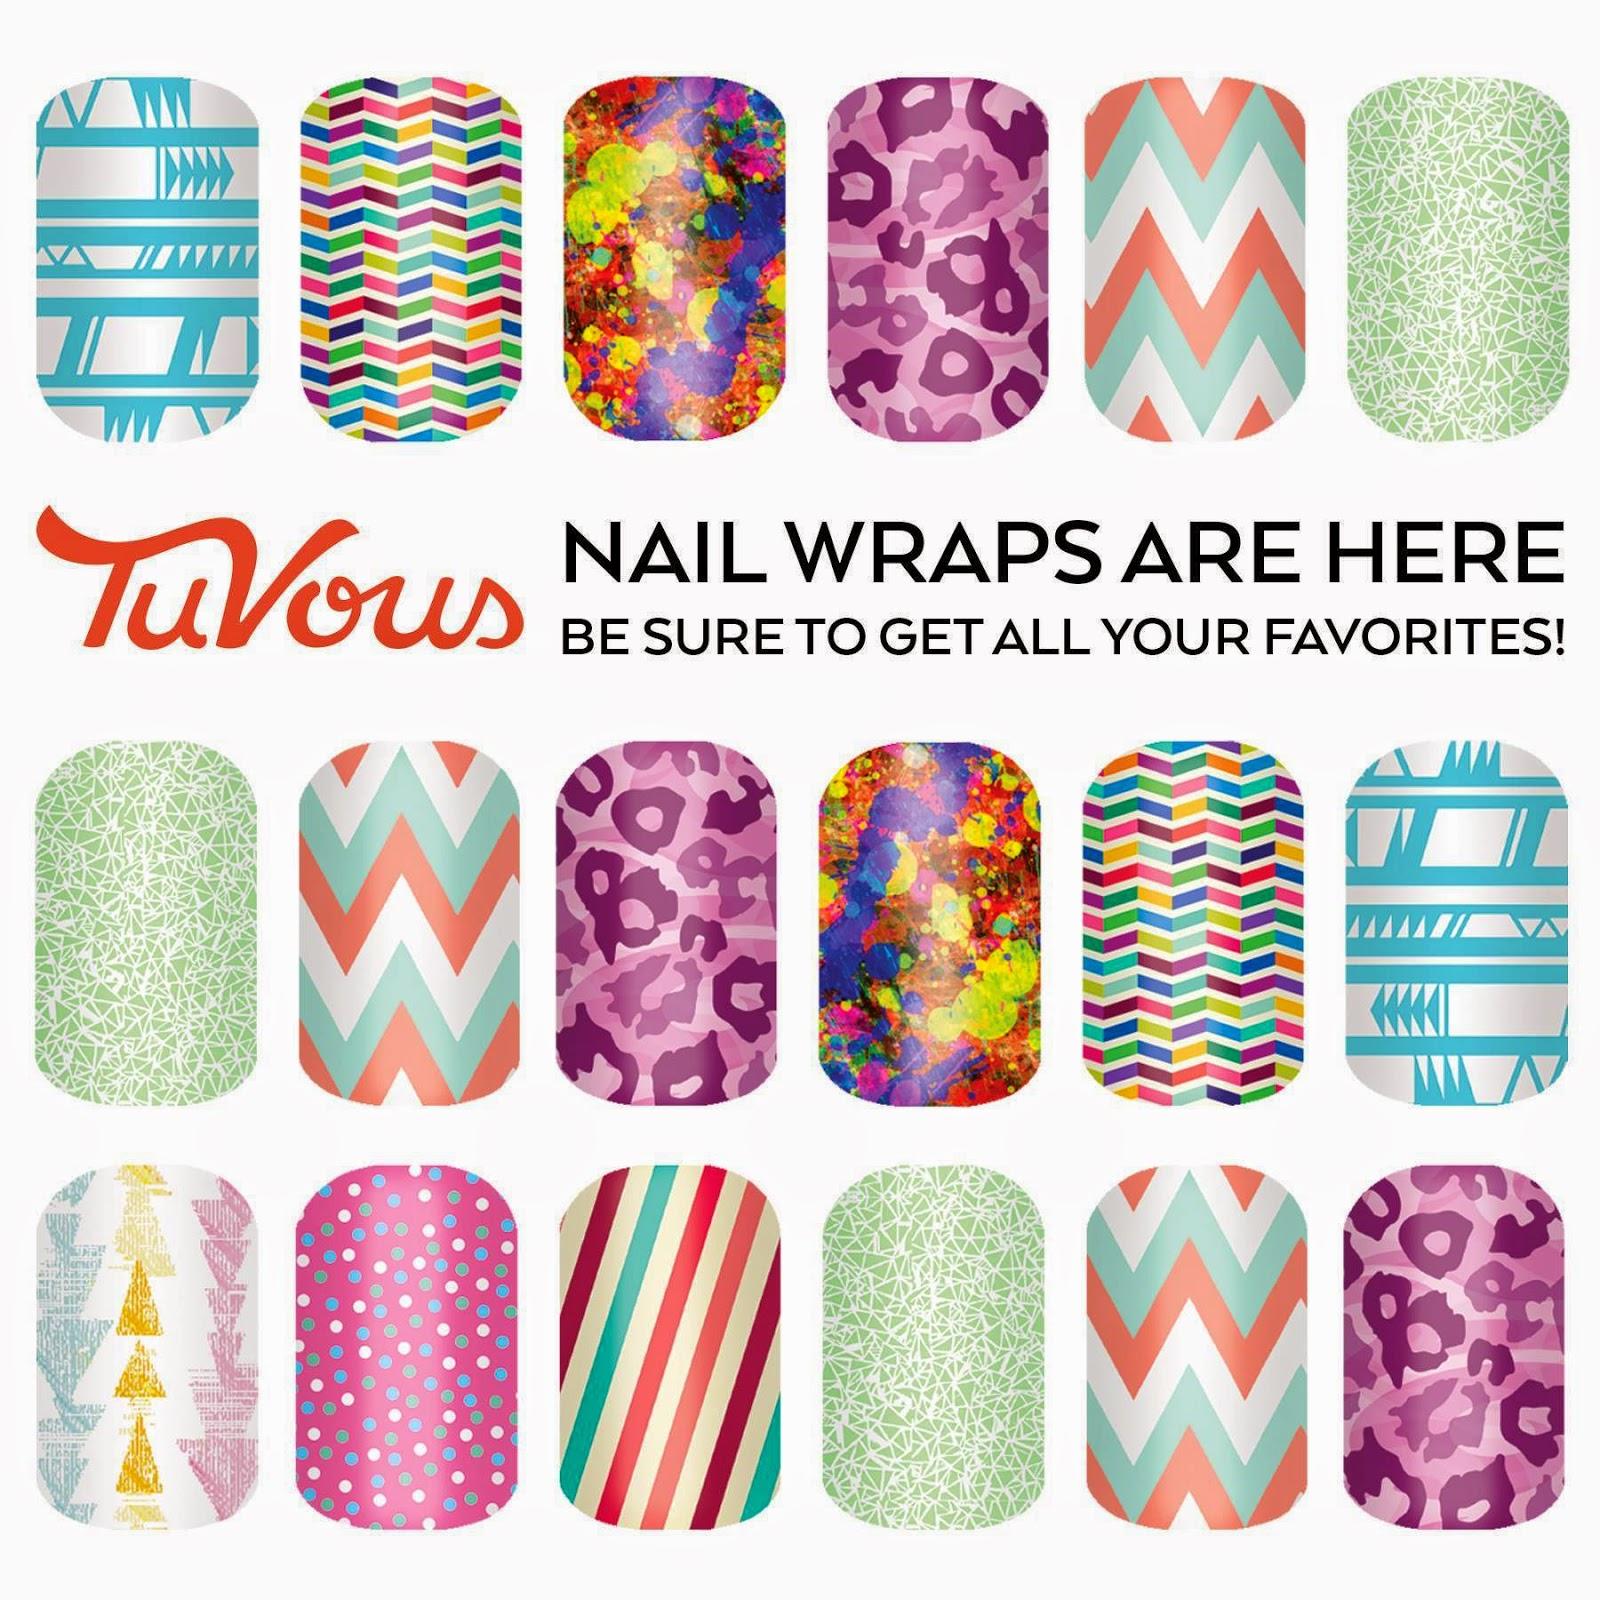 Andrea Janke Tuvous New Tuvous Nail Wraps Designs